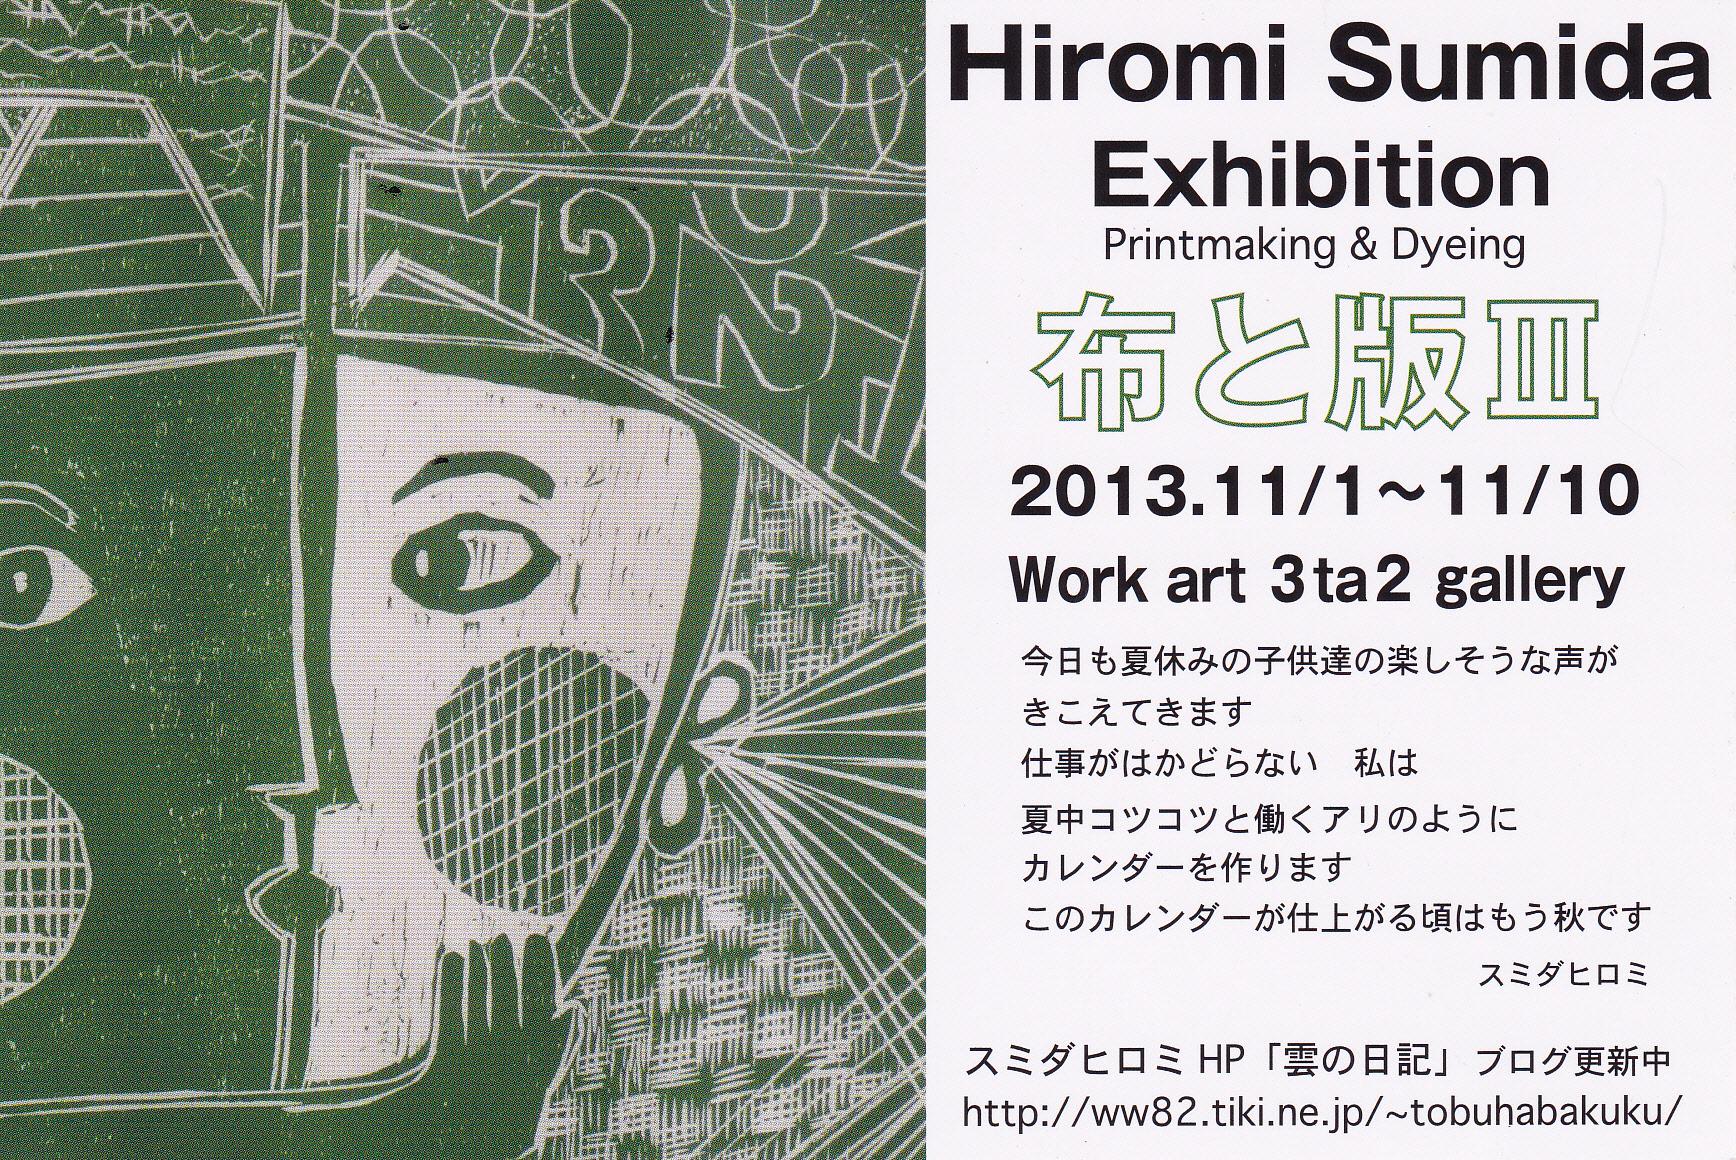 Hiromi Sumida Exhibition 布と版Ⅲ